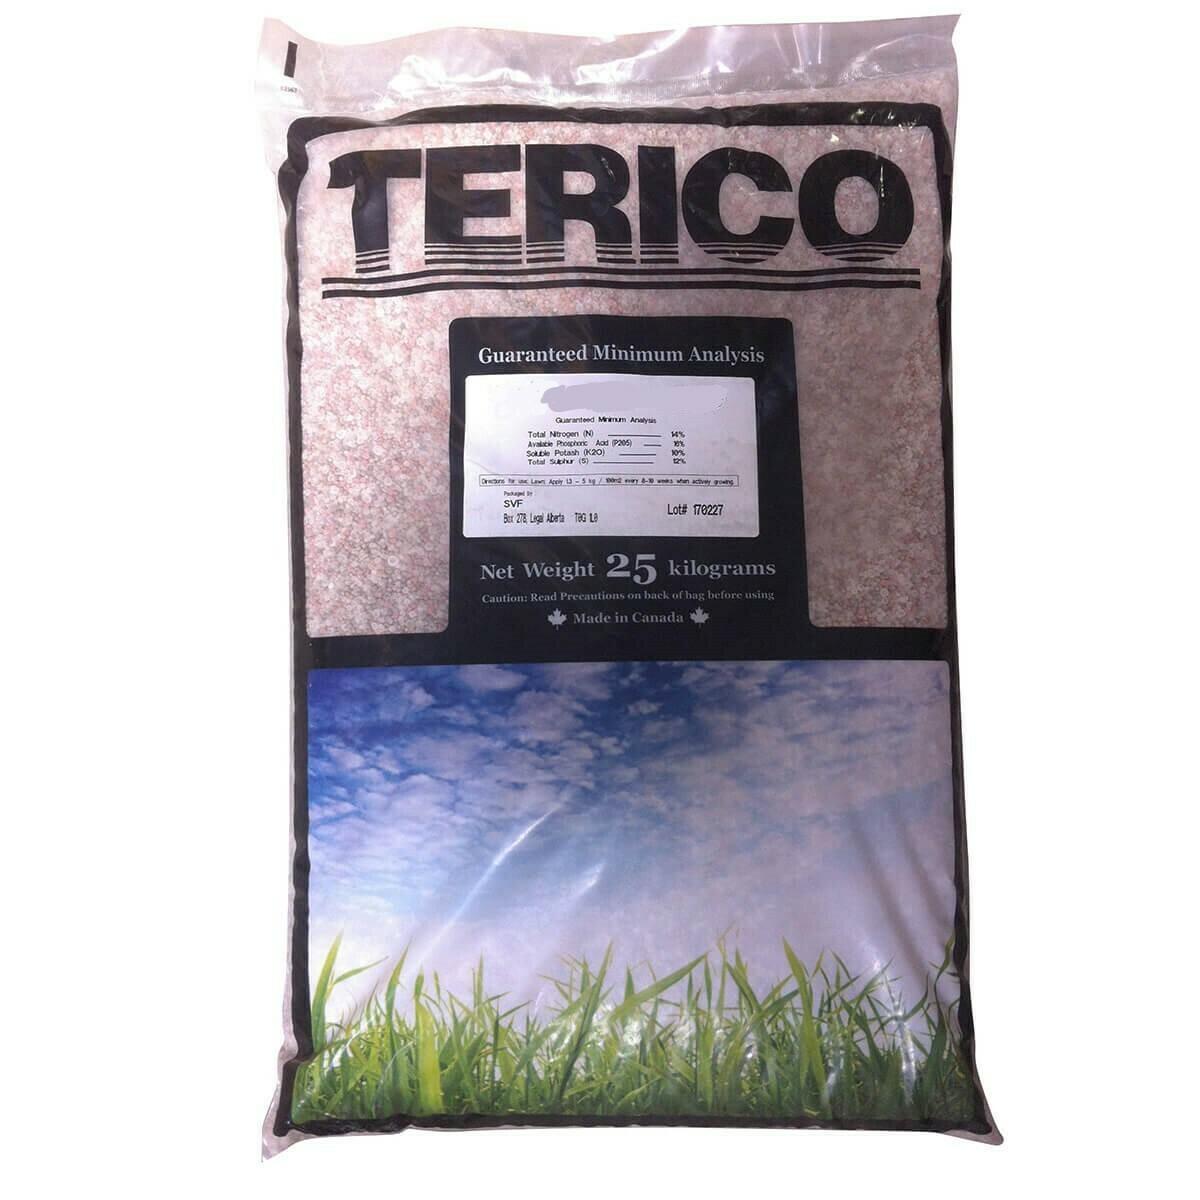 Terico 7-24-24 - 25Kg